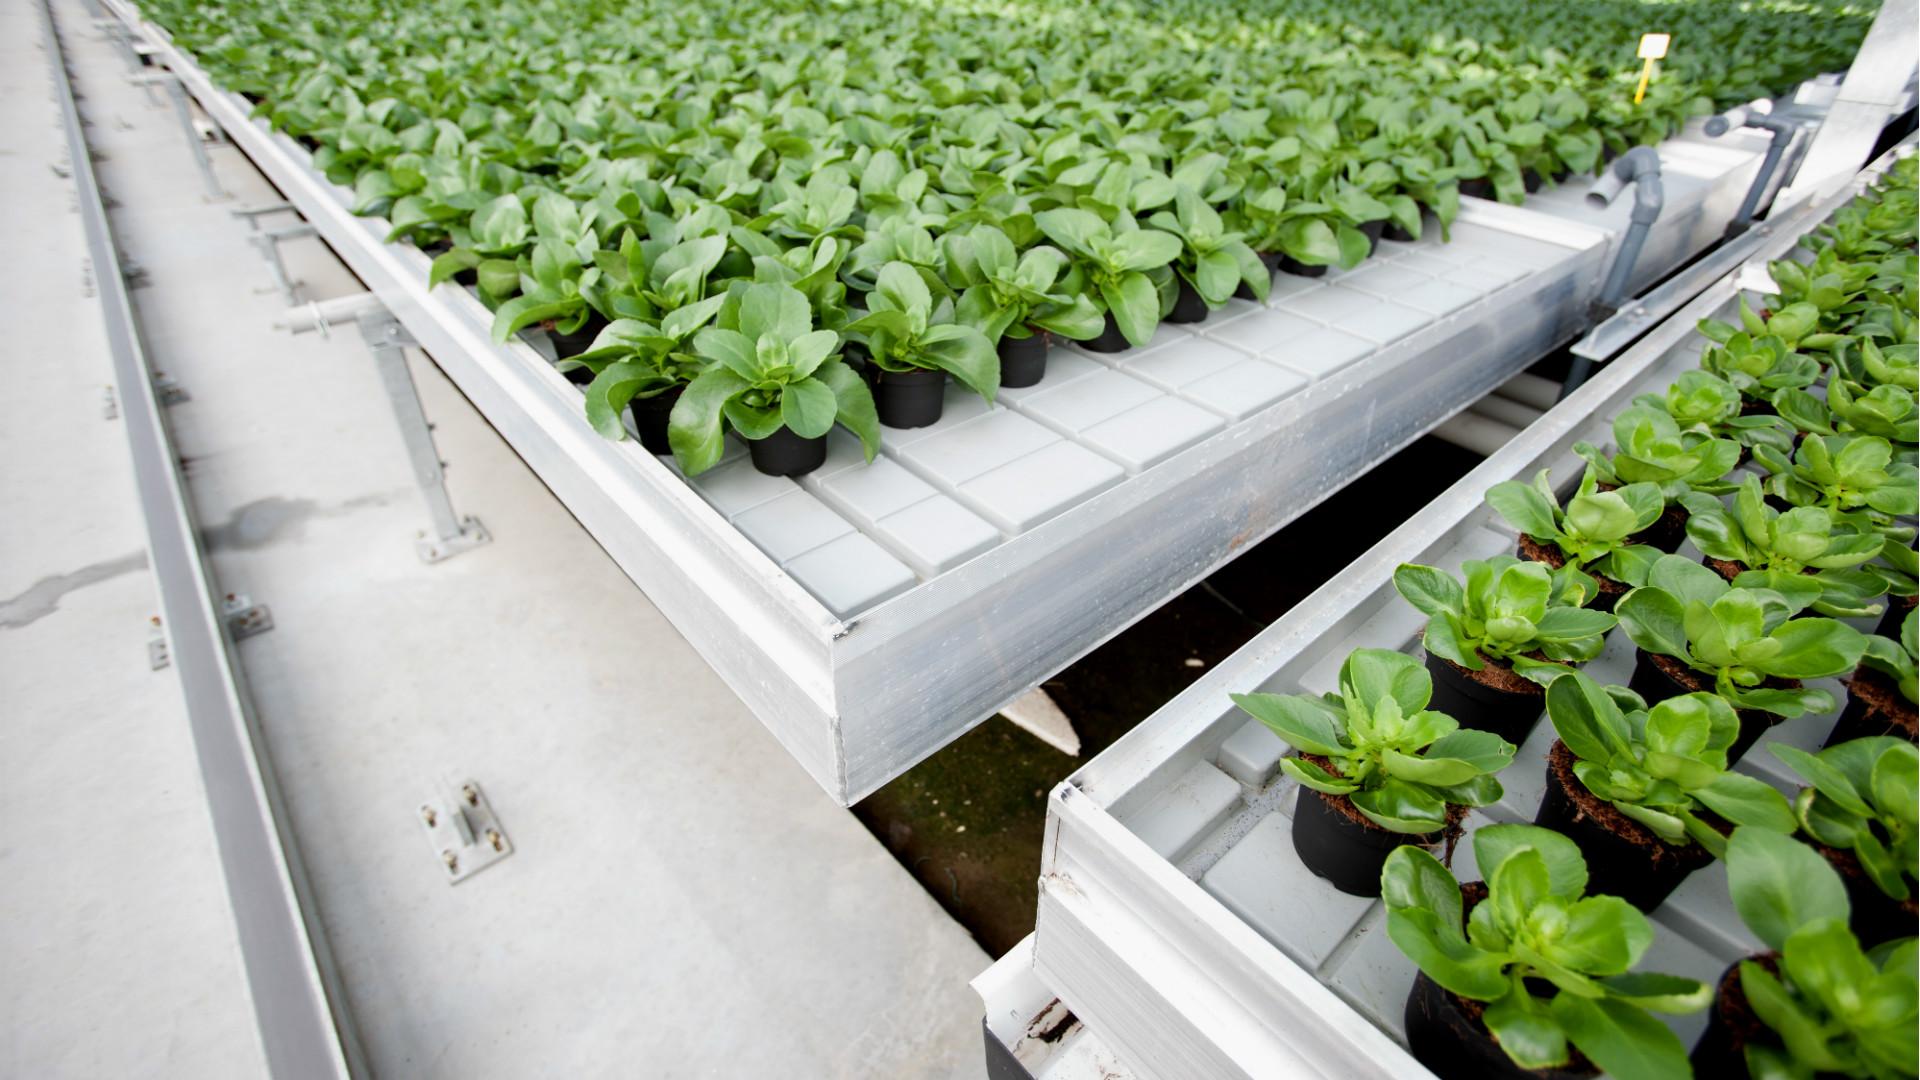 Cultivation solutions | Alcomij